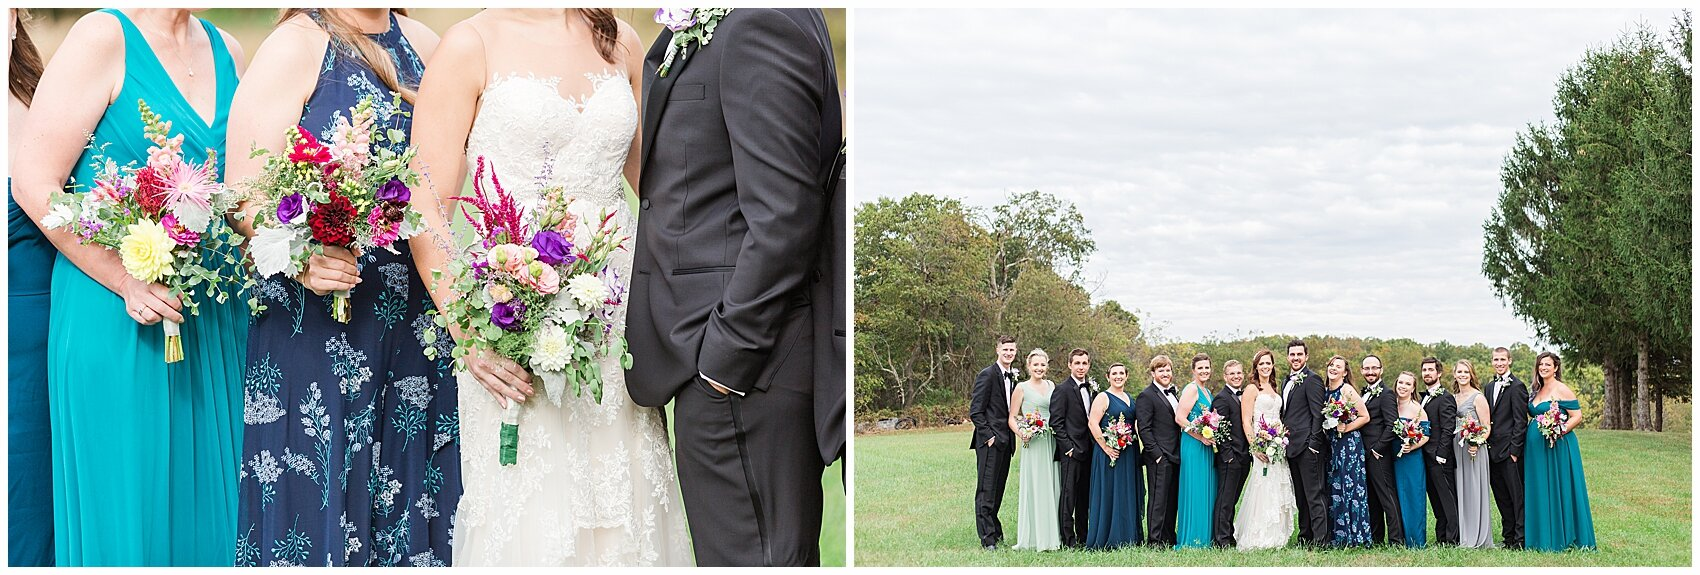 york-pa-wedding-photographer_0050.jpg